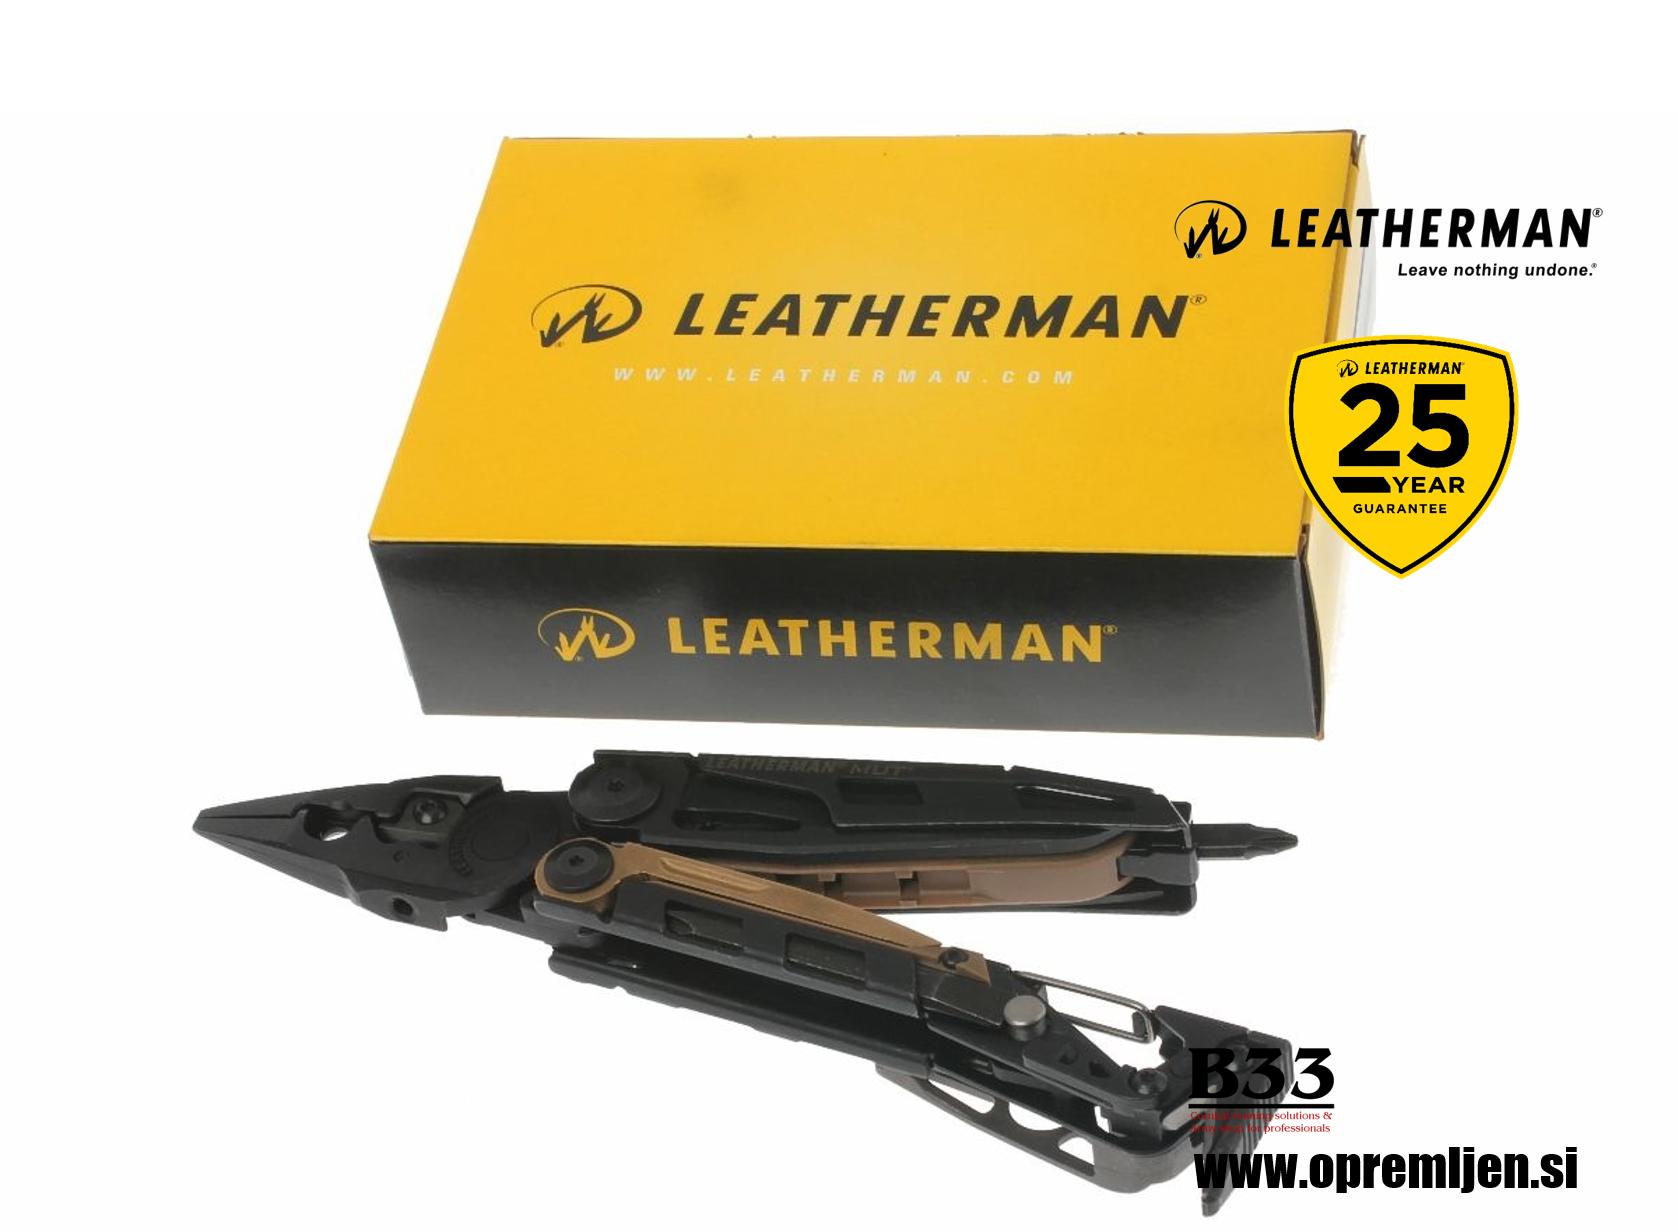 B33 army shop - Leatherman MUT EOD, večnamensko vojaško orodje by B33 army shop at www.opremljen.si, trgovina z vojaško opremo, vojaška trgovina